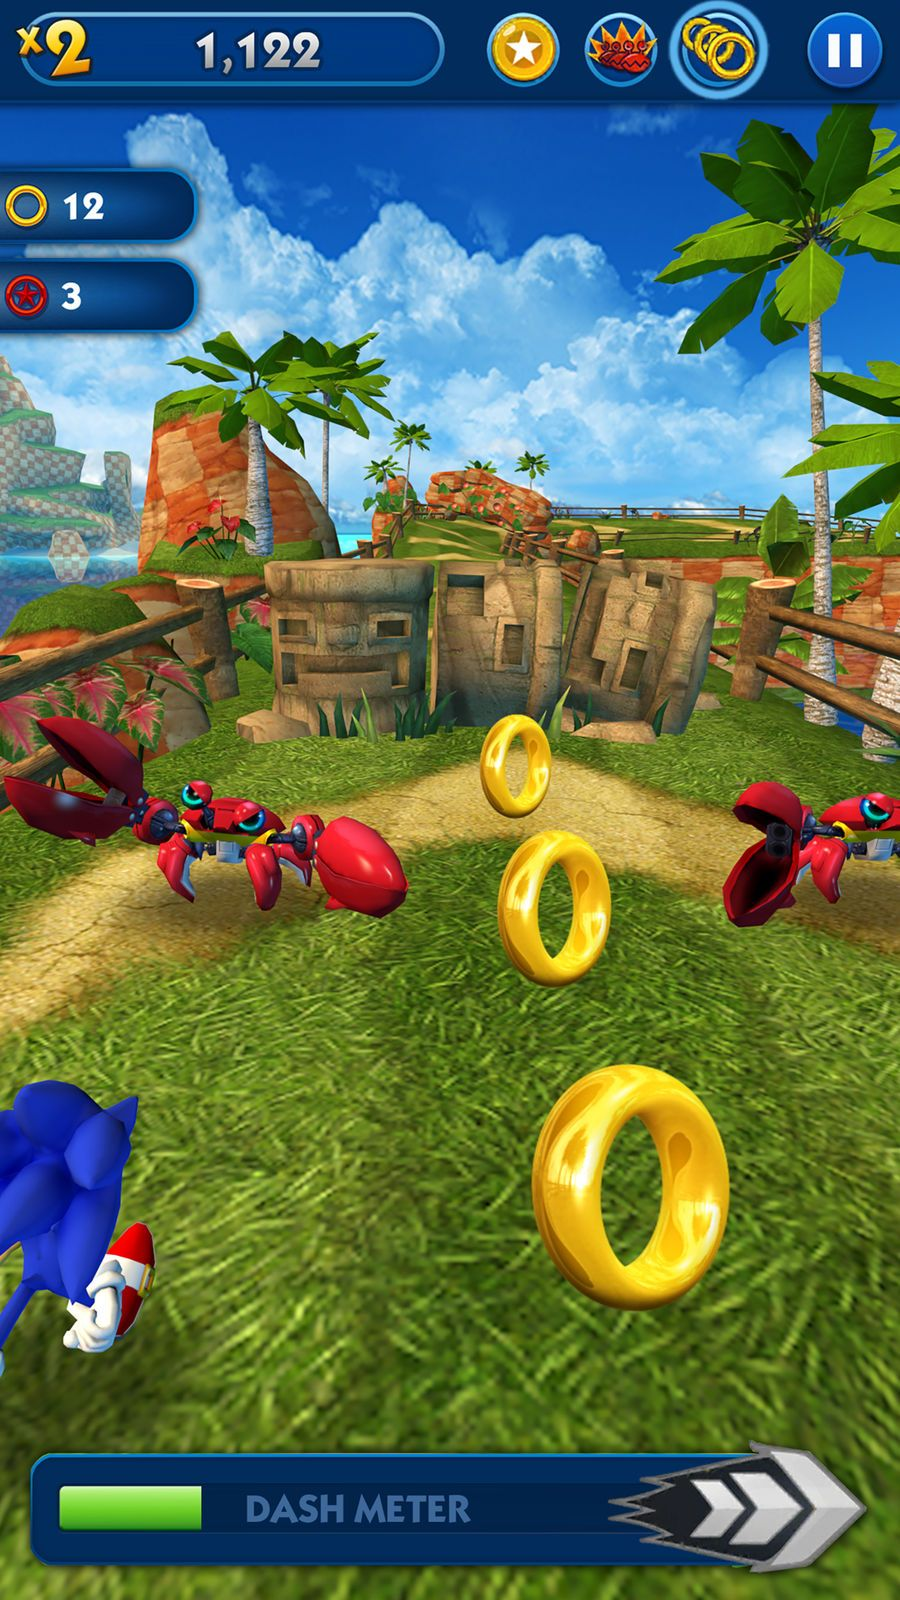 Sonic Dash ArcadeActionappsios Sonic dash, Game